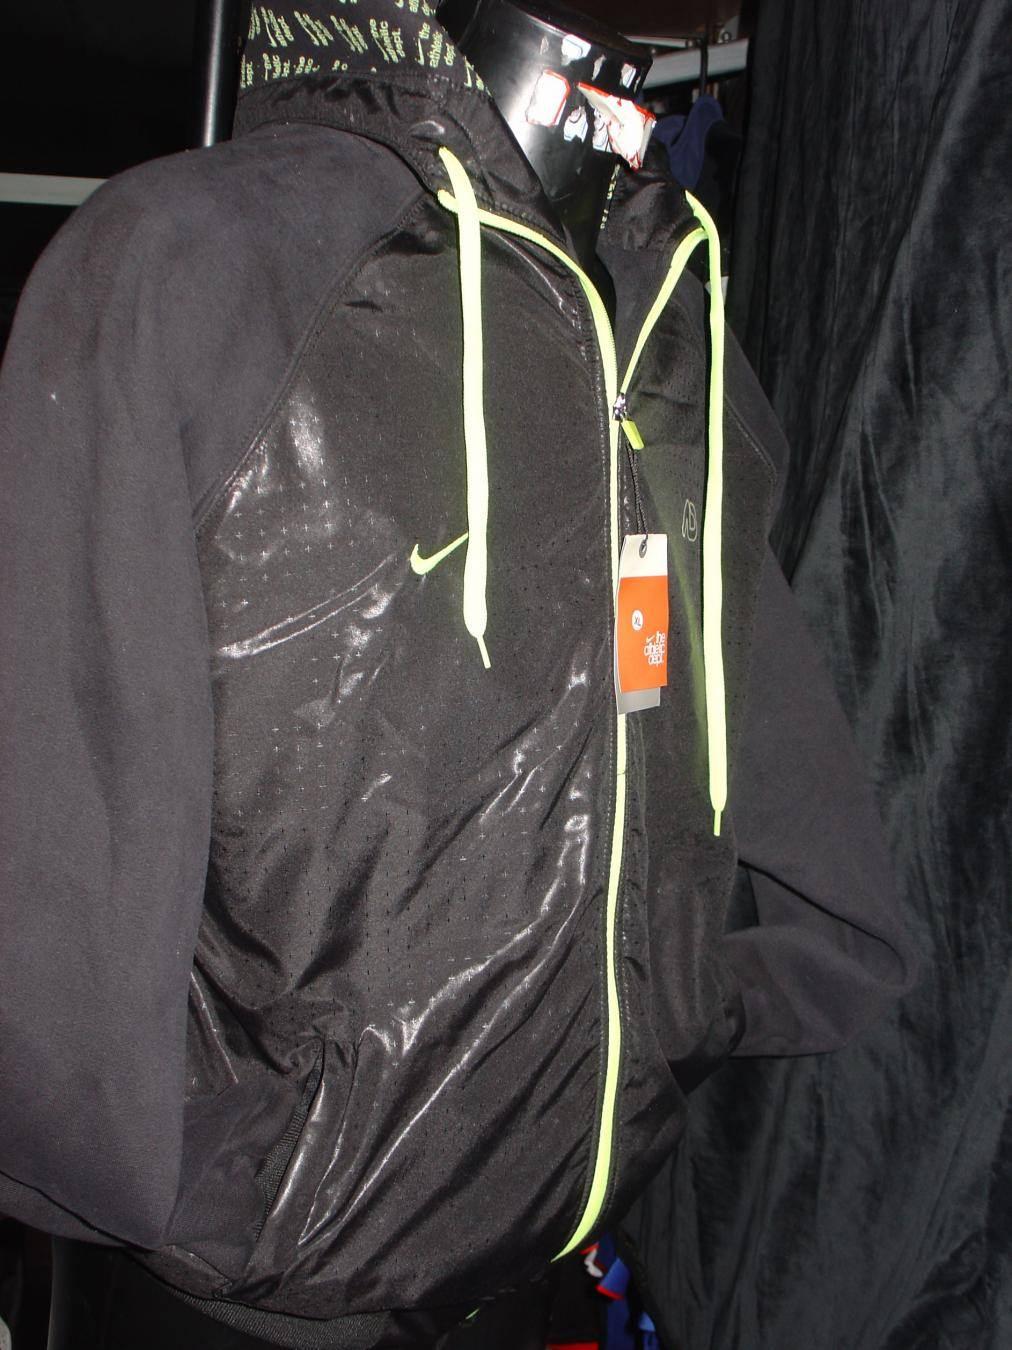 Duks Jakna Nike Crna Flo Zelena SniŽenje Kupindo Com 9974912